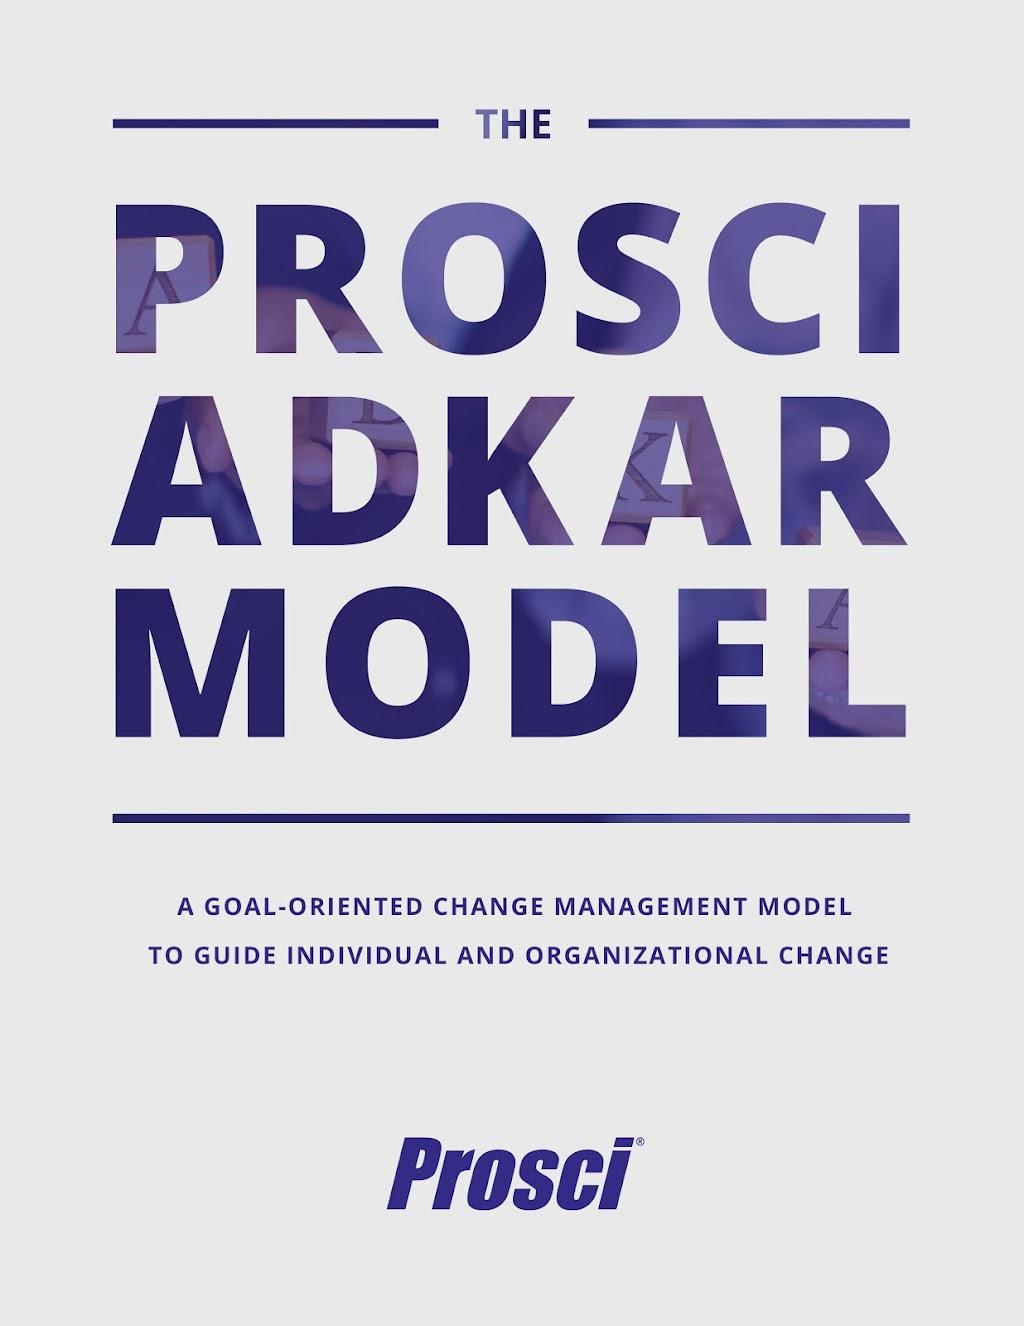 Prosci ADKAR Model Overview Ebook Cover